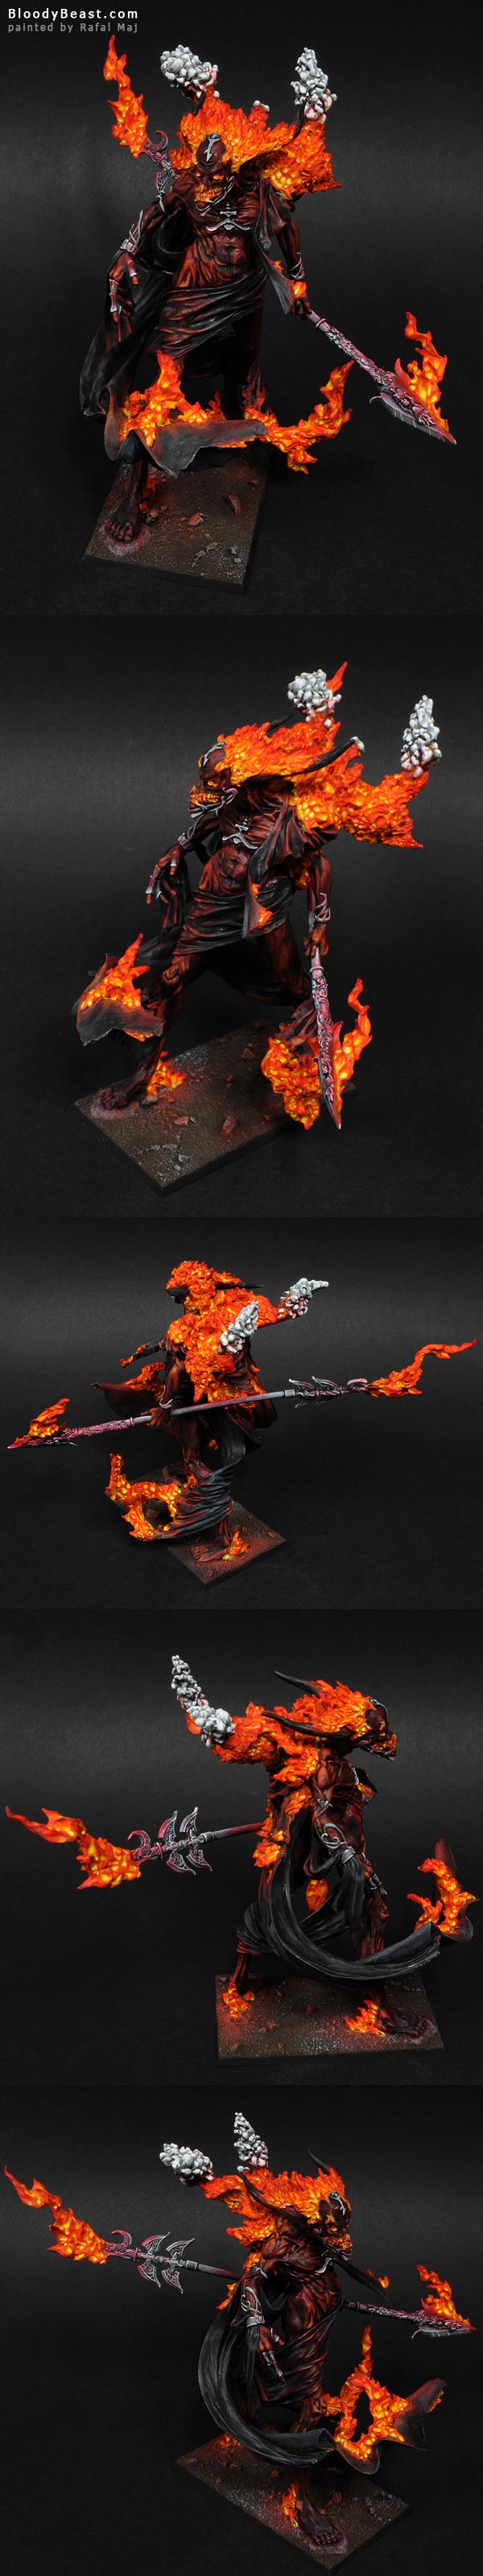 Incarnate Elemental Of Fire painted by Rafal Maj (BloodyBeast.com)